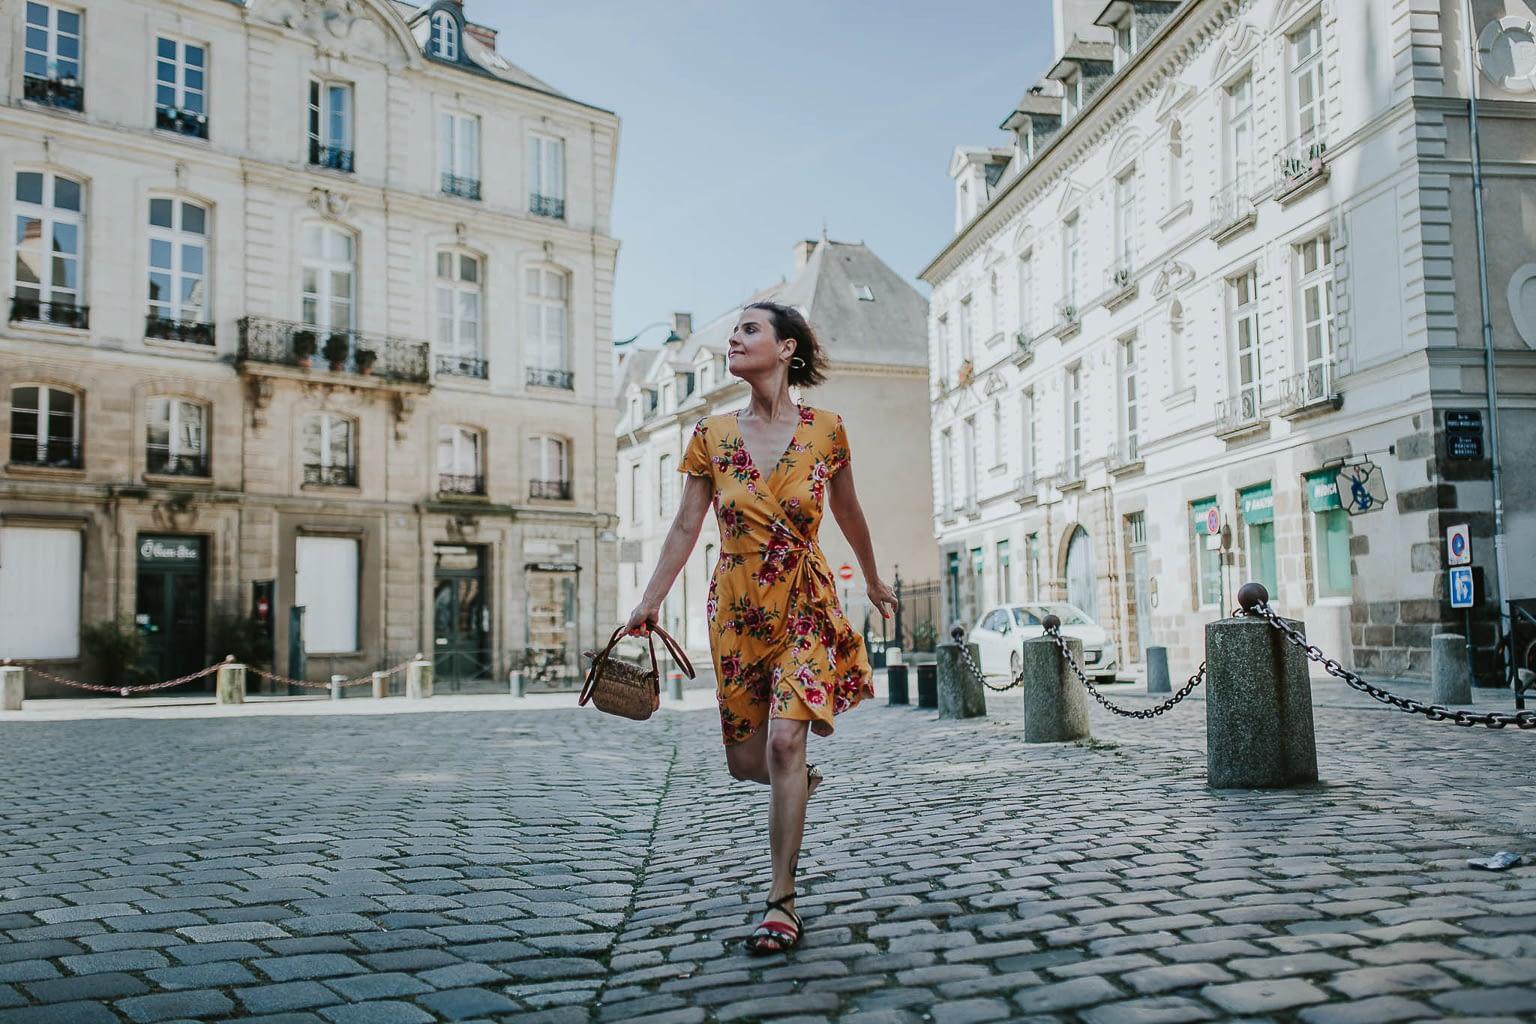 book photo professionnel femme cathédrale rennes bretagne